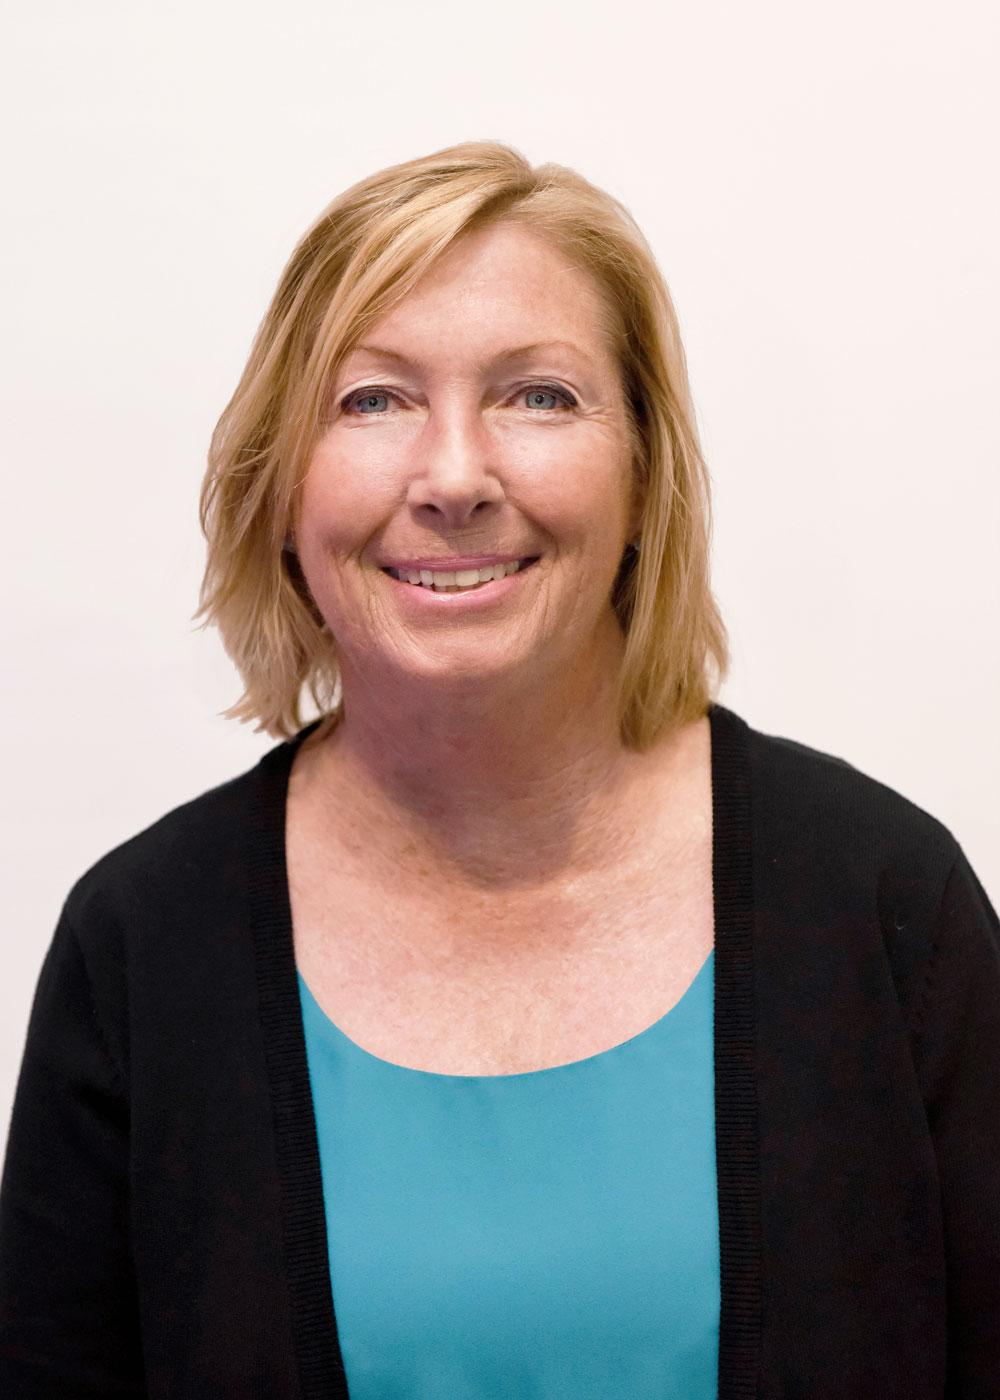 Barbara Hylton